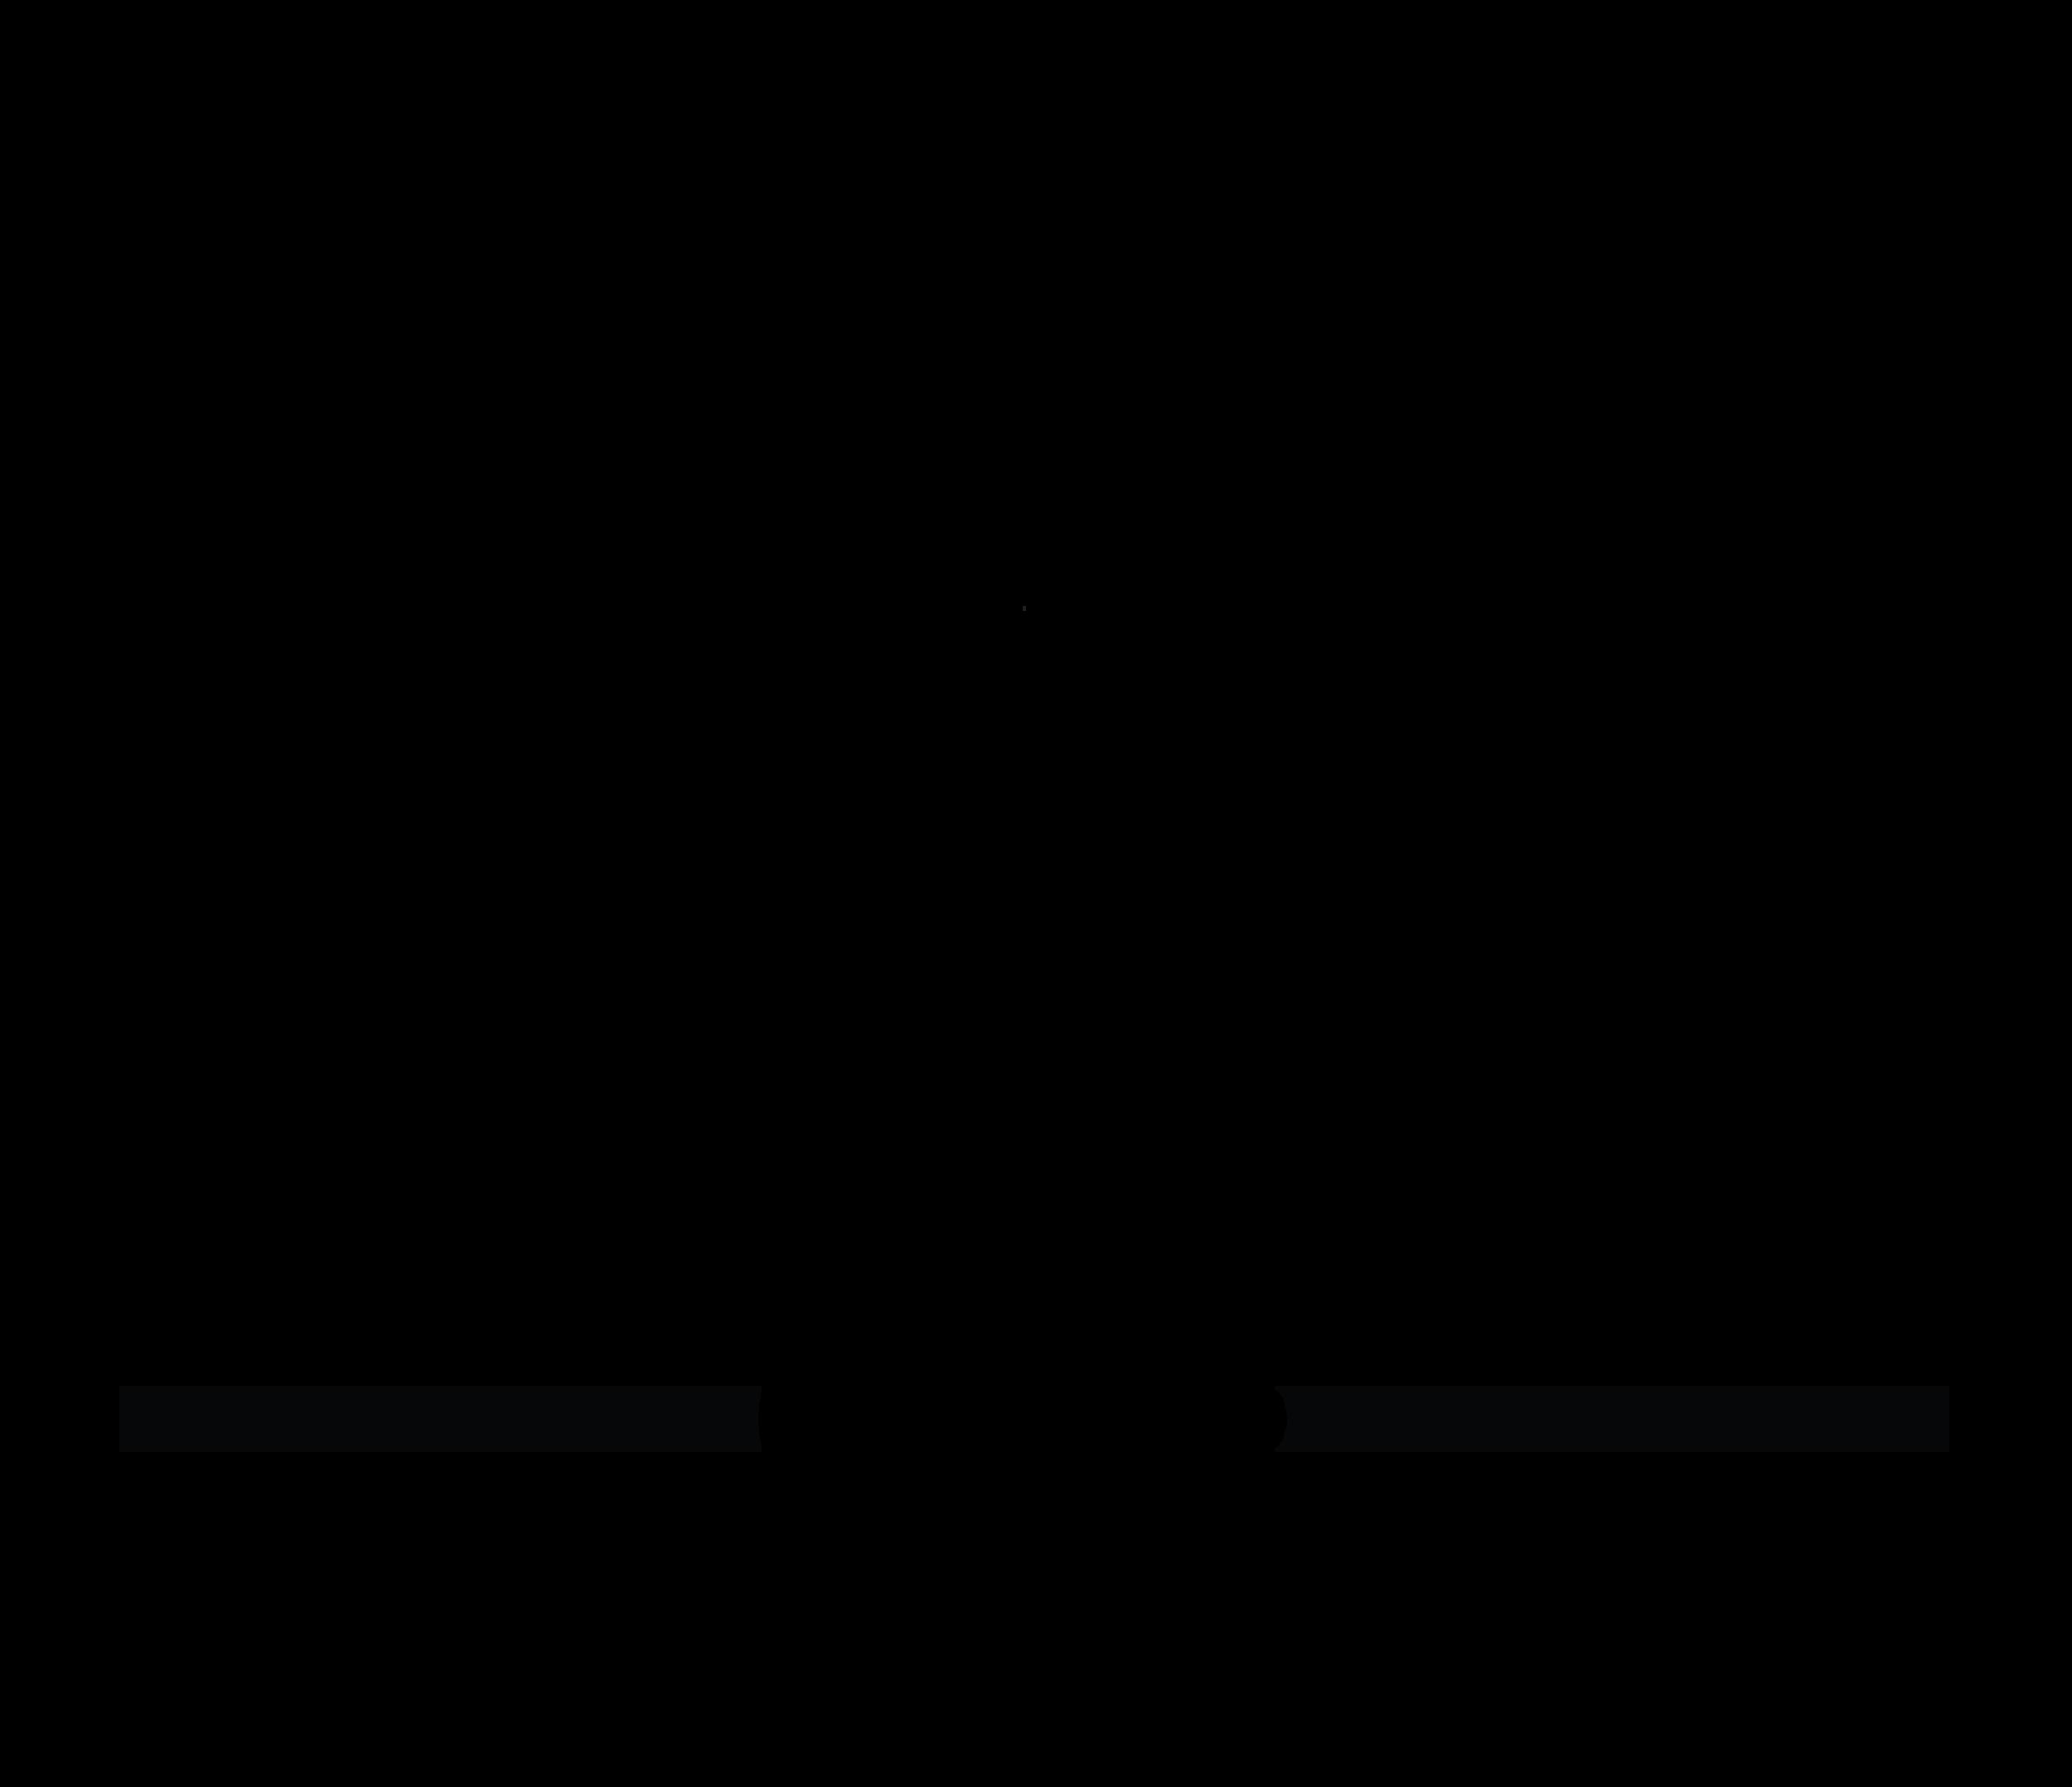 logo-final BLACK-01.png